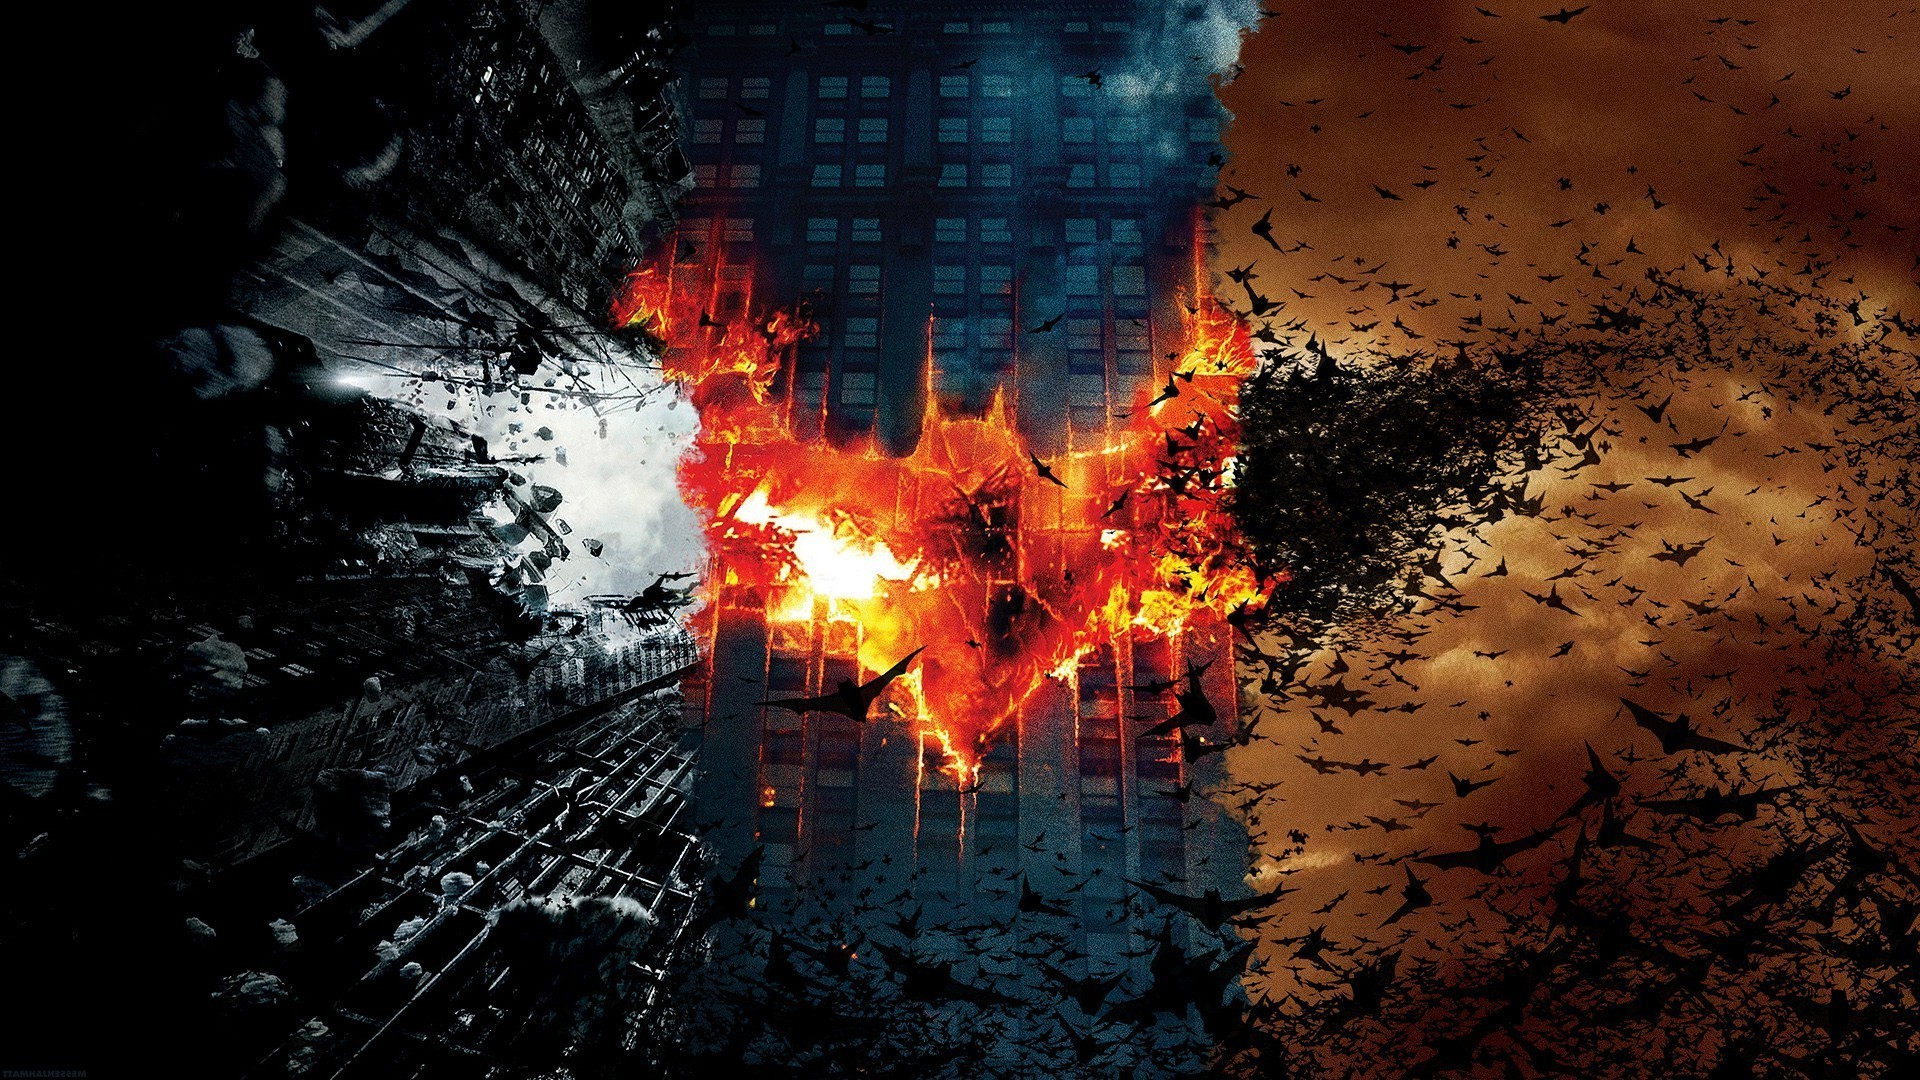 Dark Knight Falls Wallpaper The Dark Knight Background 70 Images